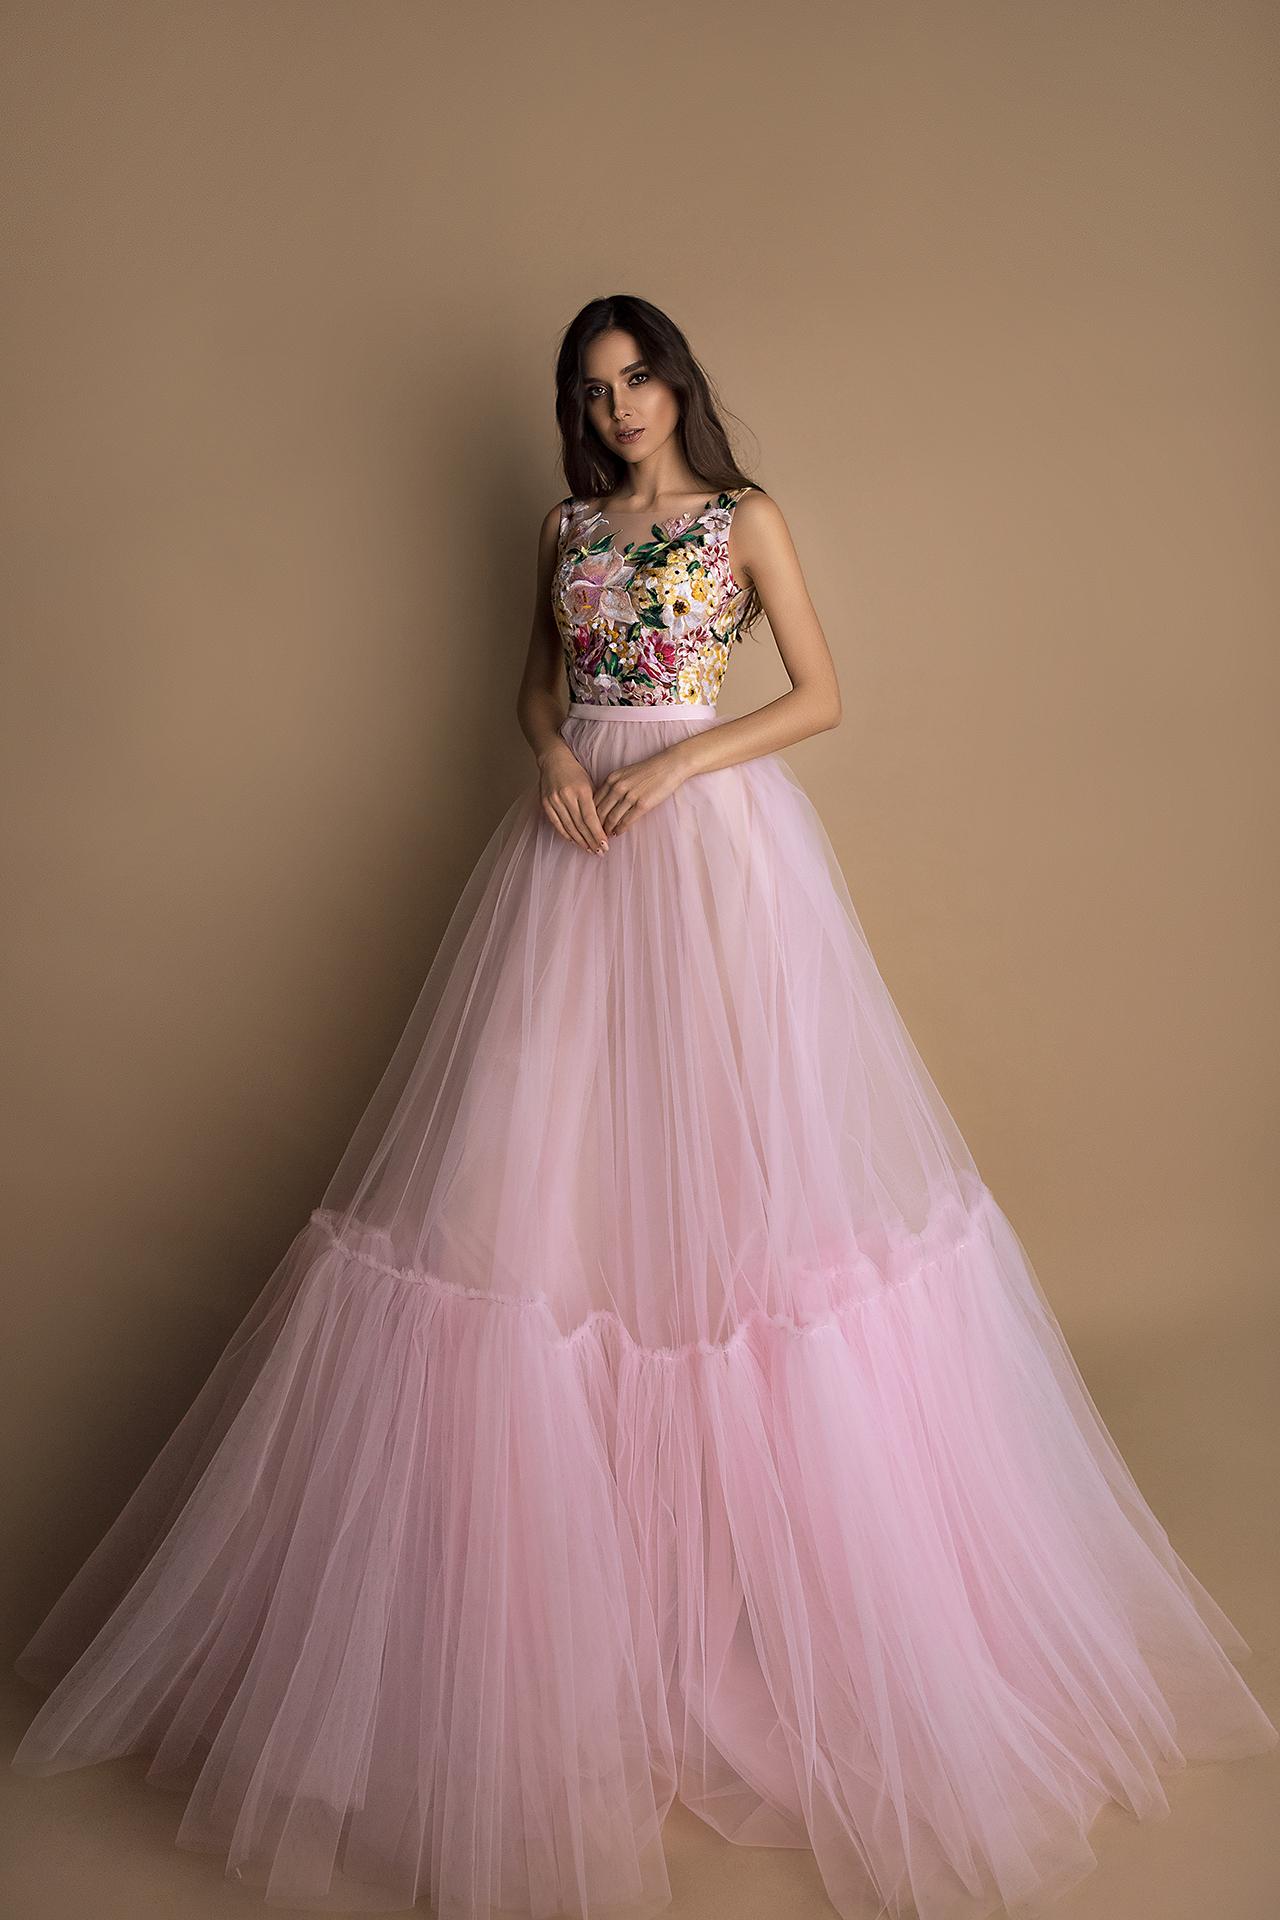 Evening Dresses 1599 Silhouette  A Line  Color  Pink  Neckline  Portrait (V-neck)  Sleeves  Wide straps  Train  No train